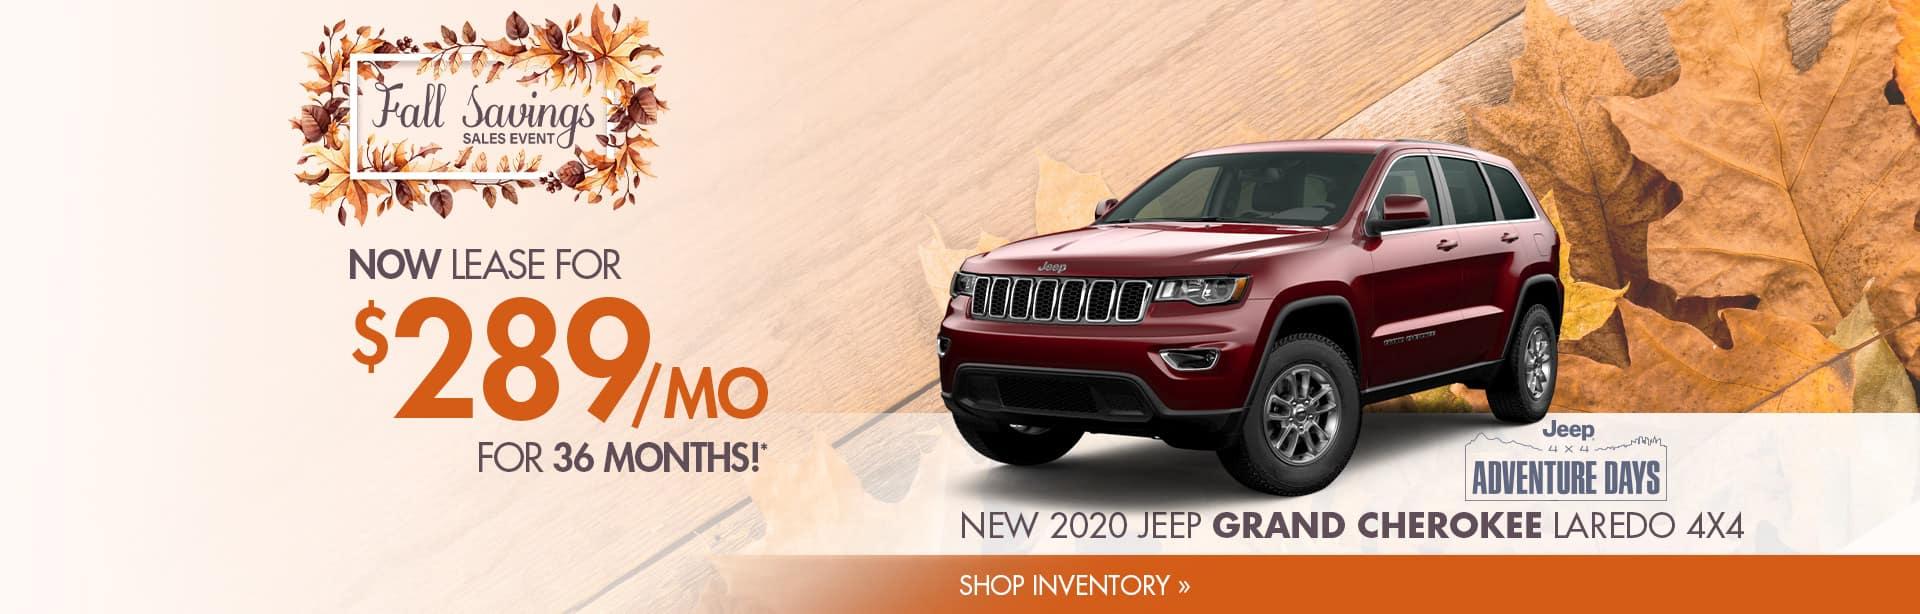 2020 Jeep Grand Cherokee in Crawfordsville, IN.